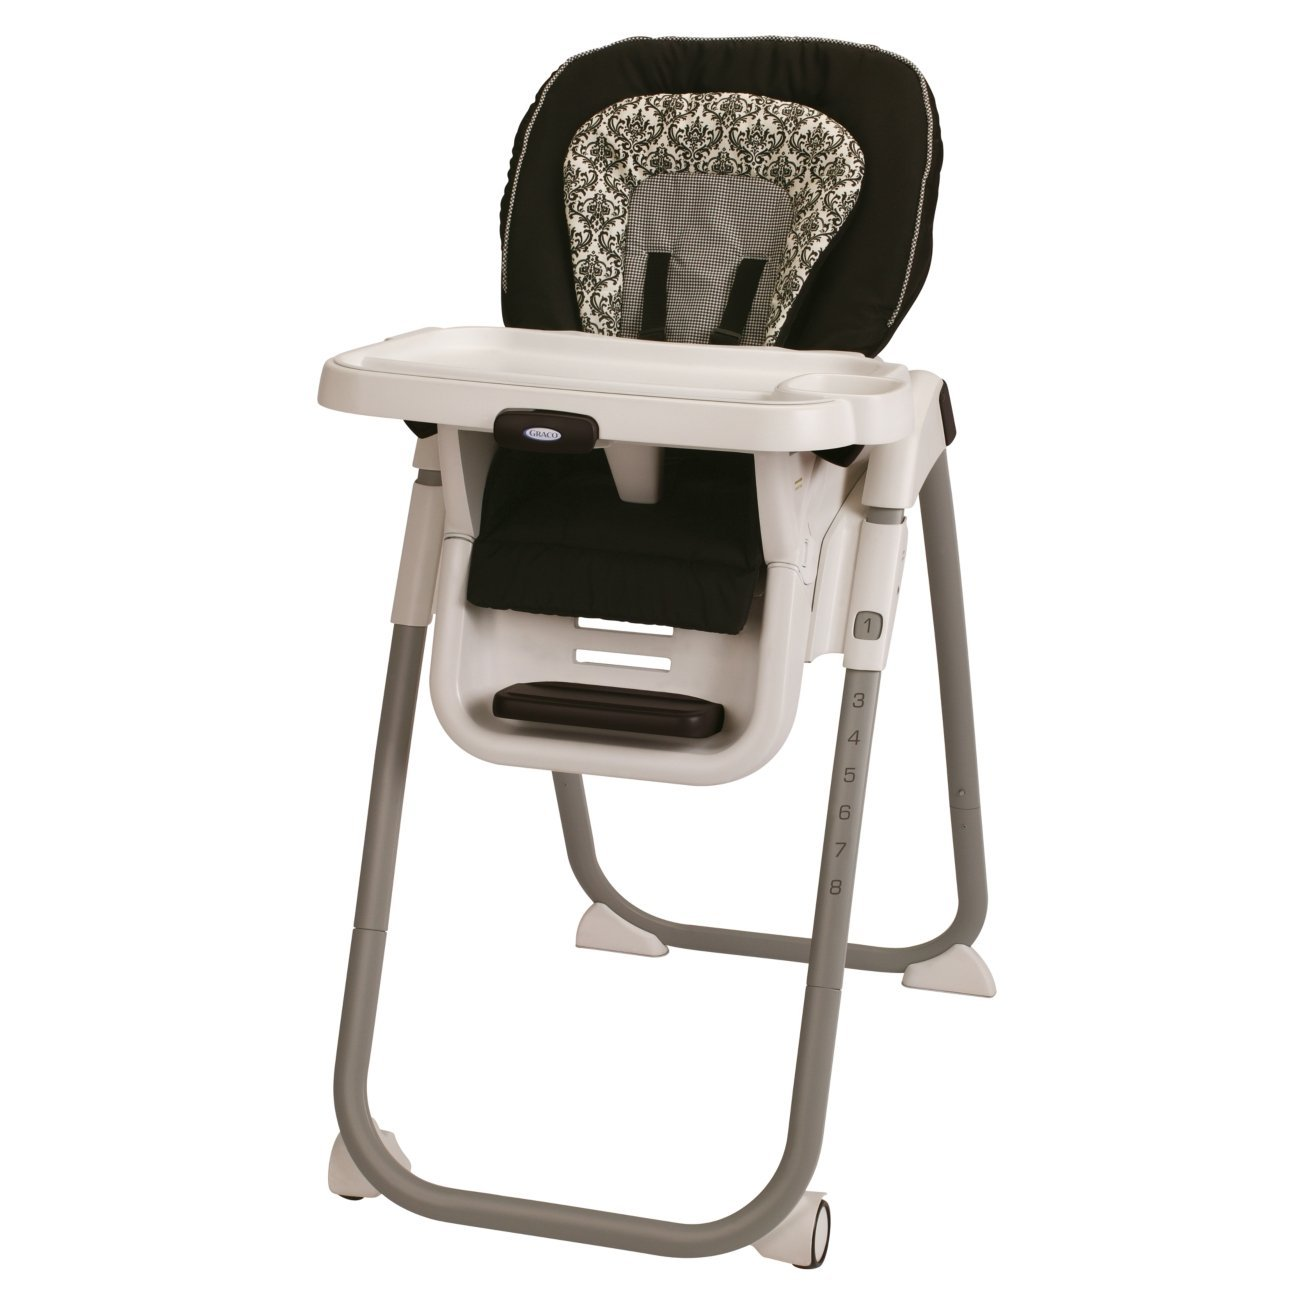 graco tablefit high chair, best high chair for baby, best high chair for toddler, best high chair